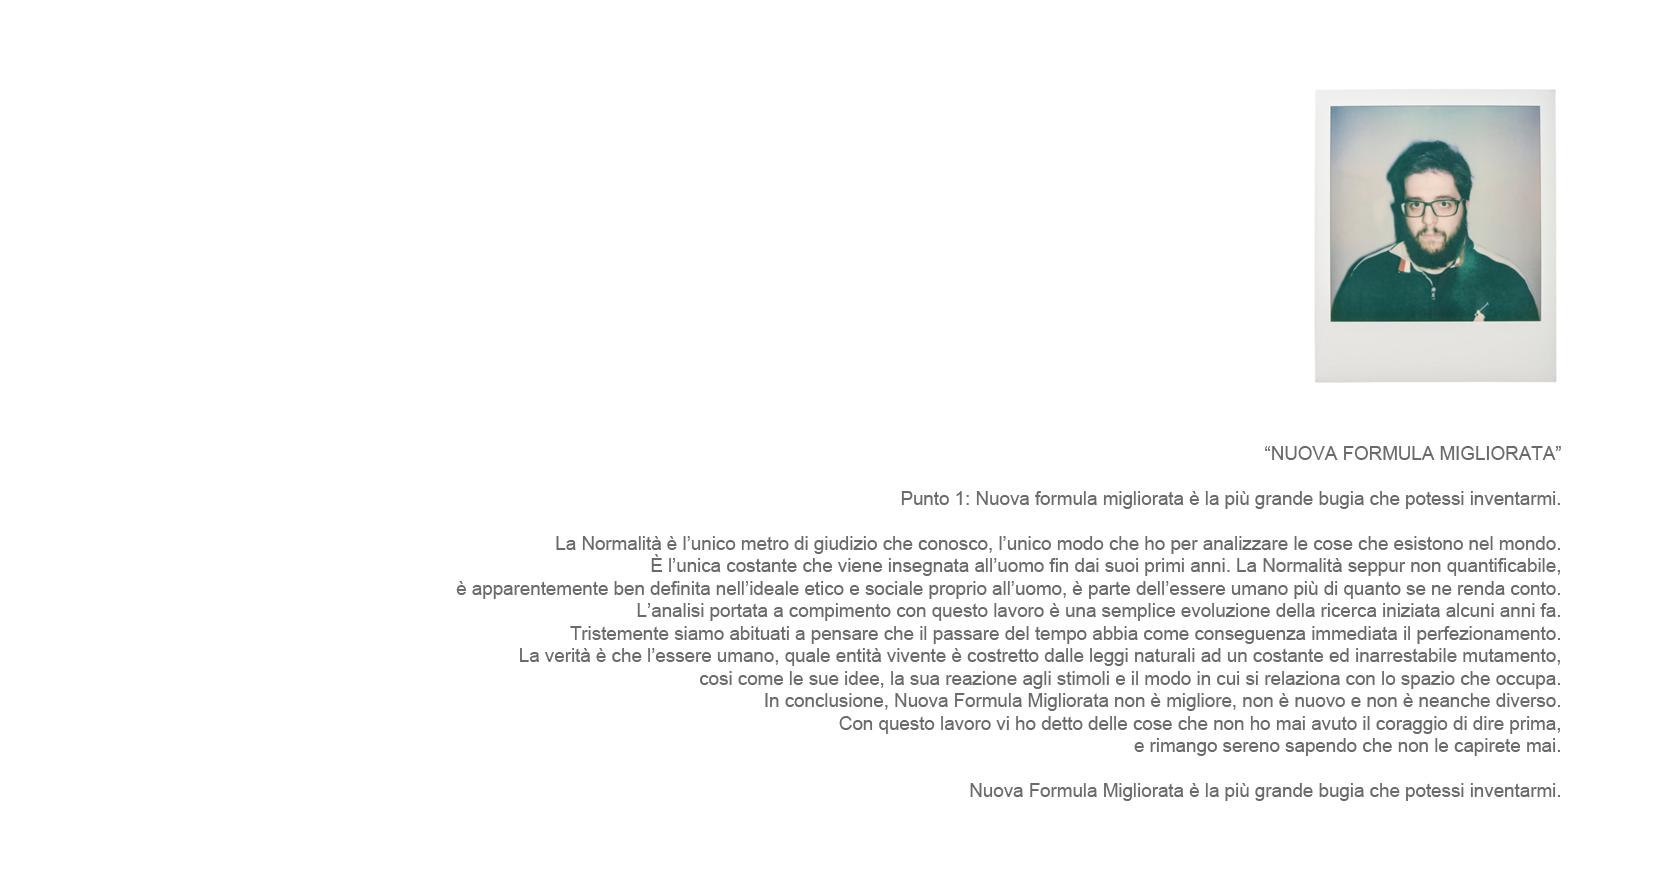 08-Vicenzo-Borrelli-Portrait.jpg